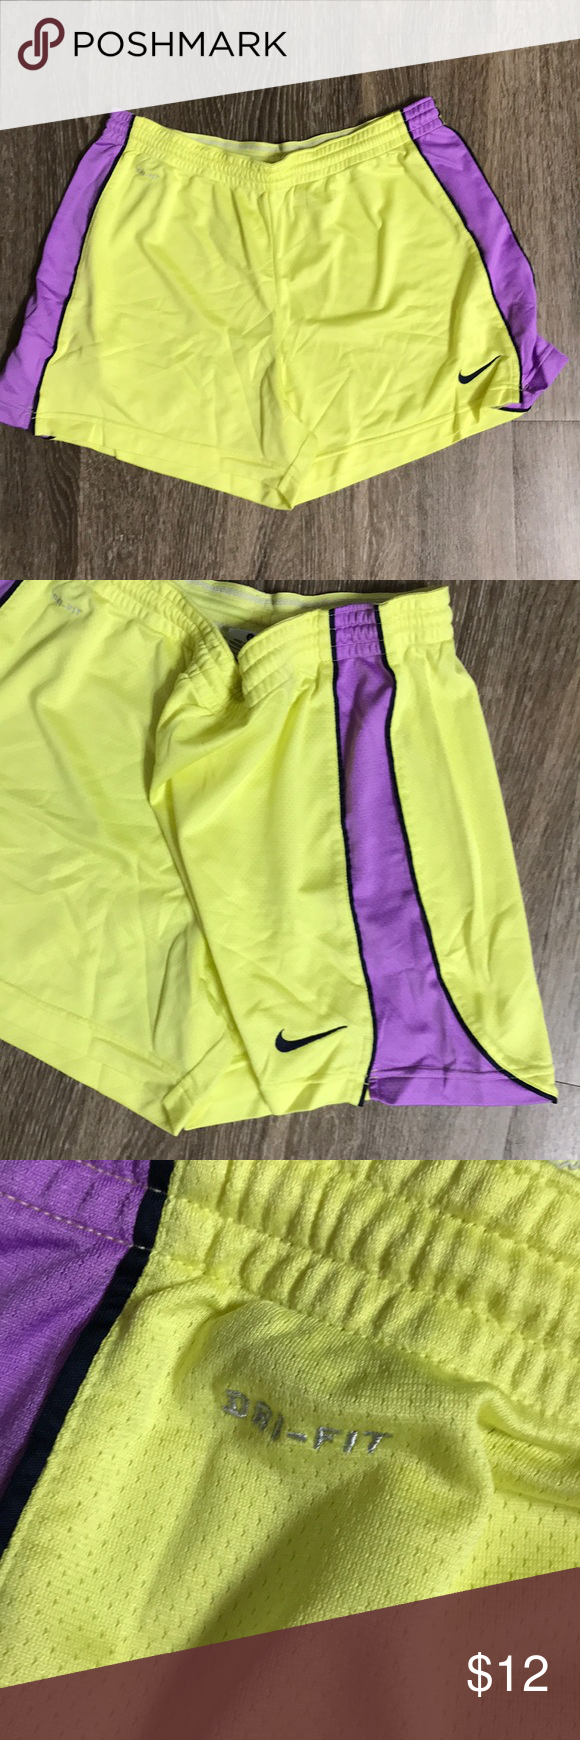 Yellow Purple Nike Dri Fit Shorts Large Euc Nike Dri Fit Shorts Yellow With Light Purple Stripes On The Side Clothes Design Fashion Design Workout Shorts